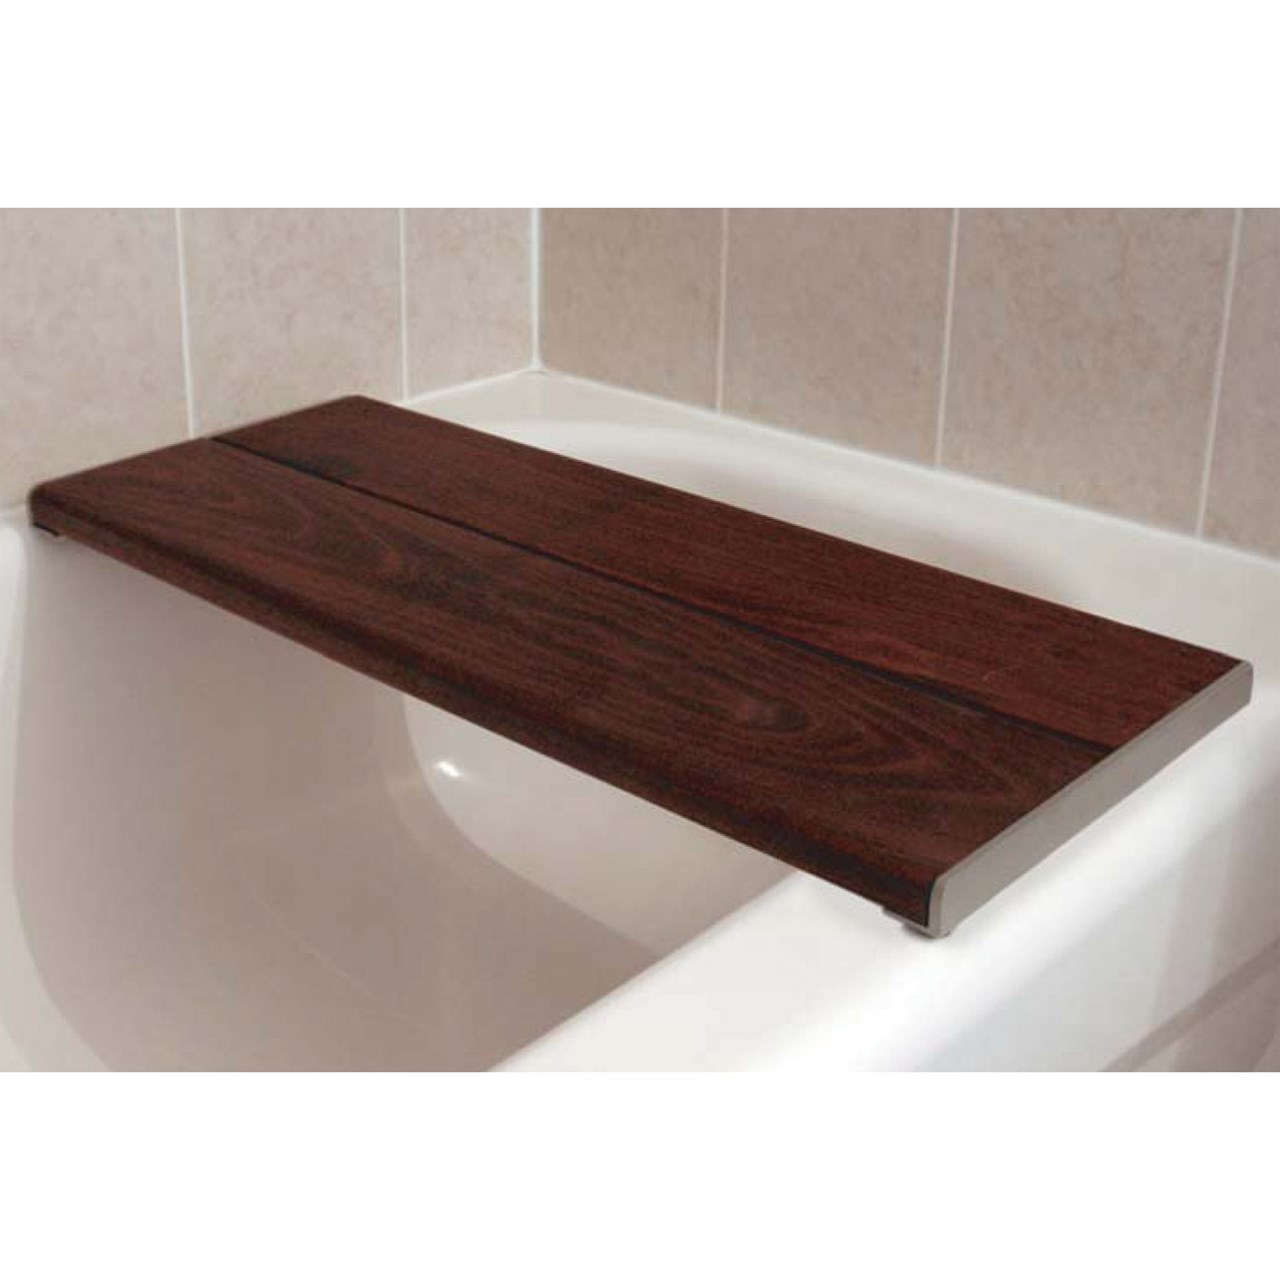 Bathroom Bench Seat